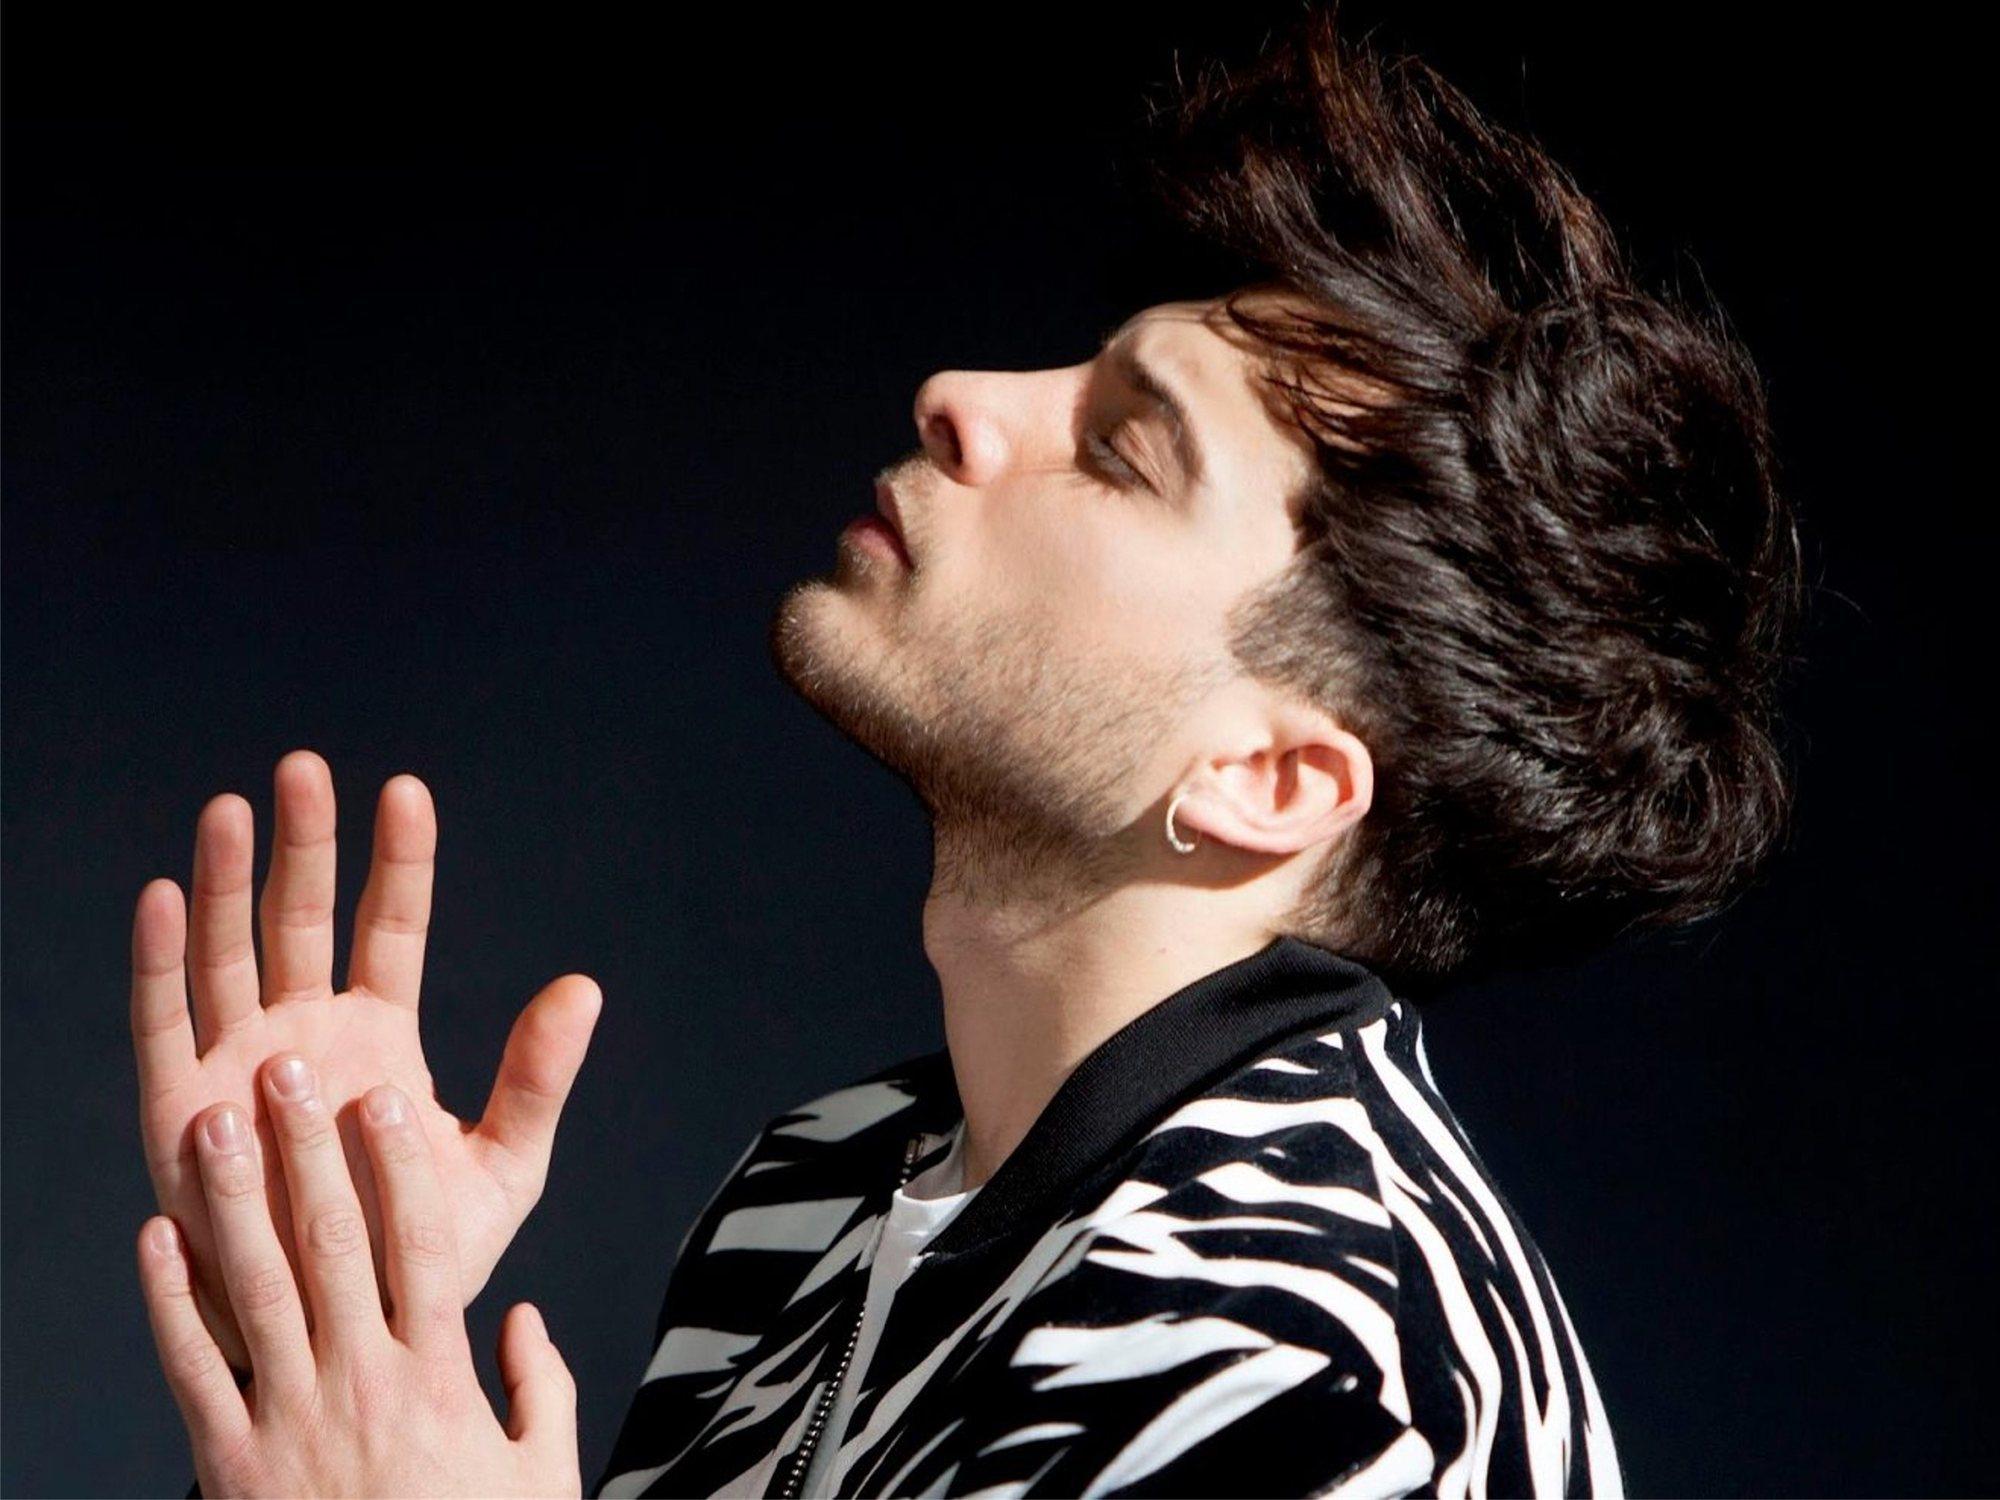 'Universo', título de la canción de Blas Cantó para Eurovisión 2020